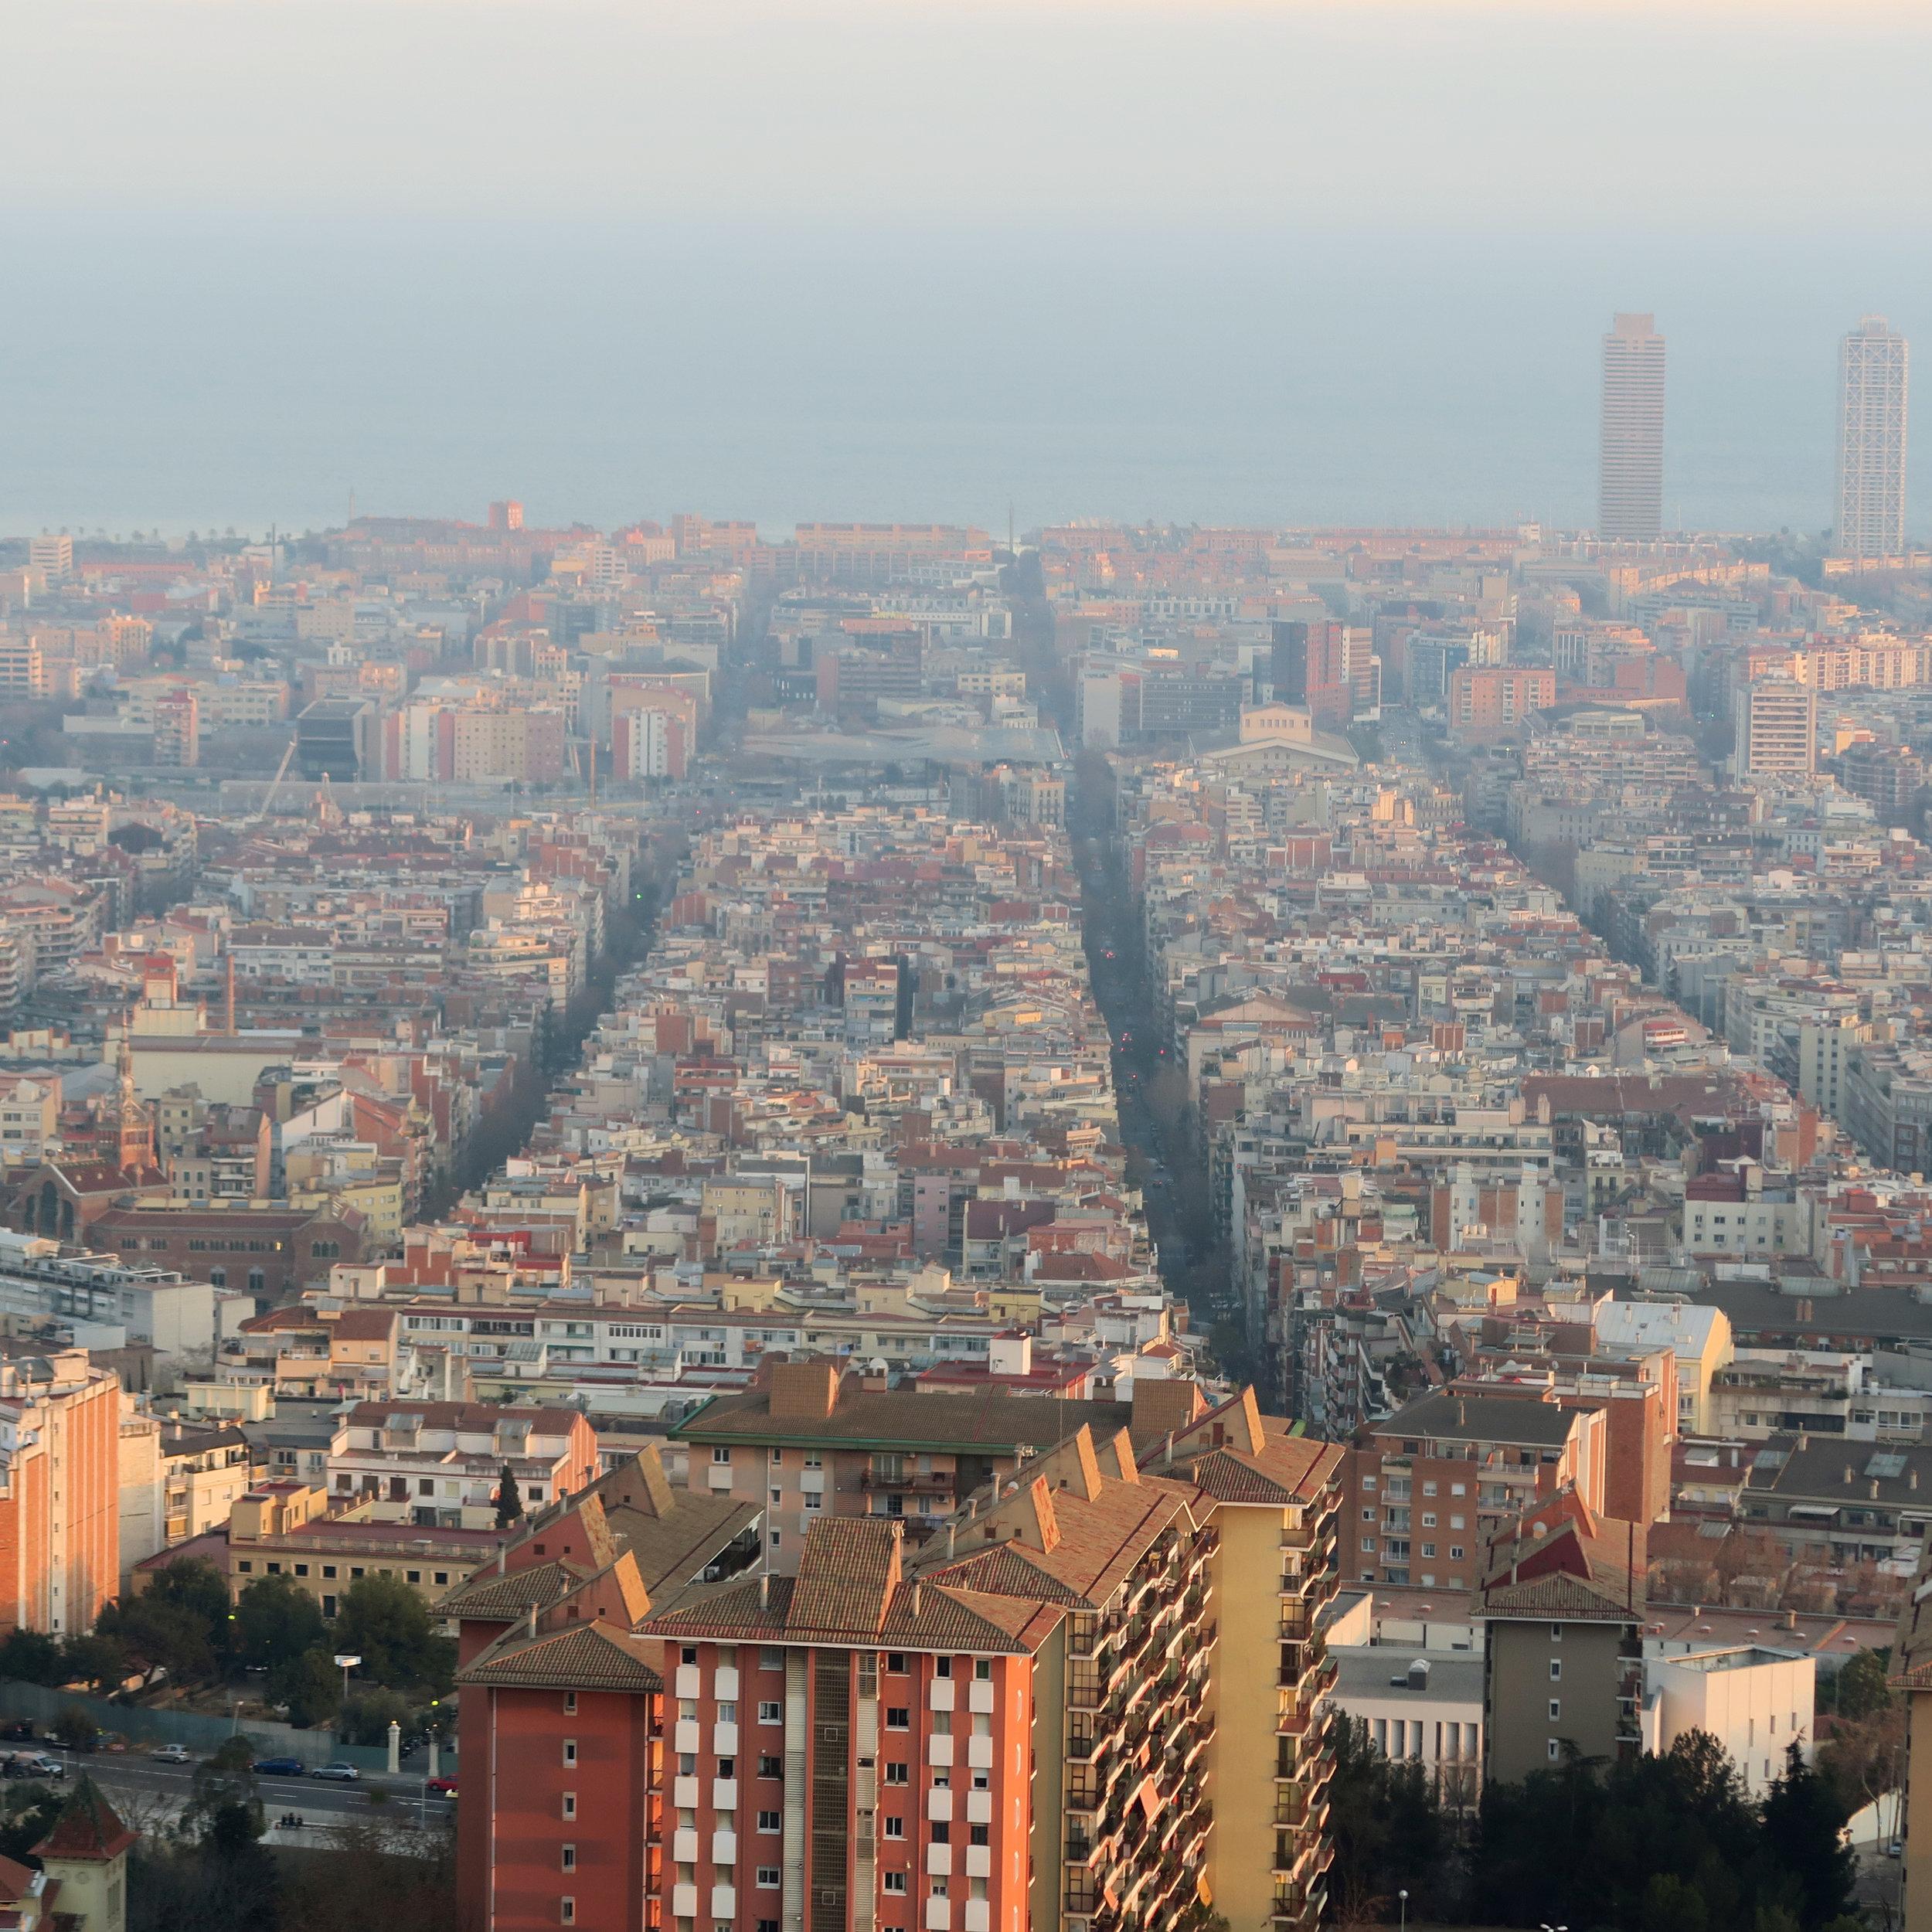 BarcelonaStreets.jpg